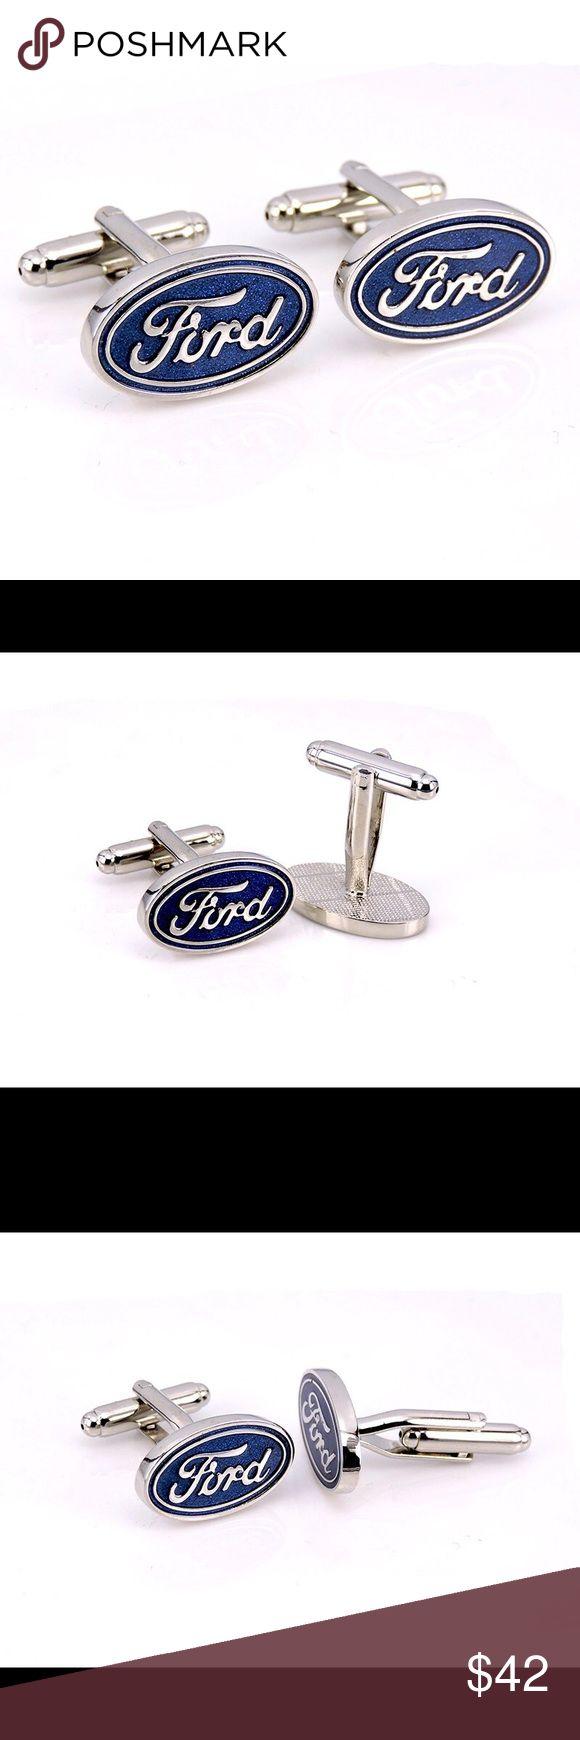 🛒Coming Soon Men's Ford Car Brand Cufflinks Cufflinks Silver plating car brand logo design Stainless Steel material men cufflinks Queen Esther Etc Accessories Cuff Links